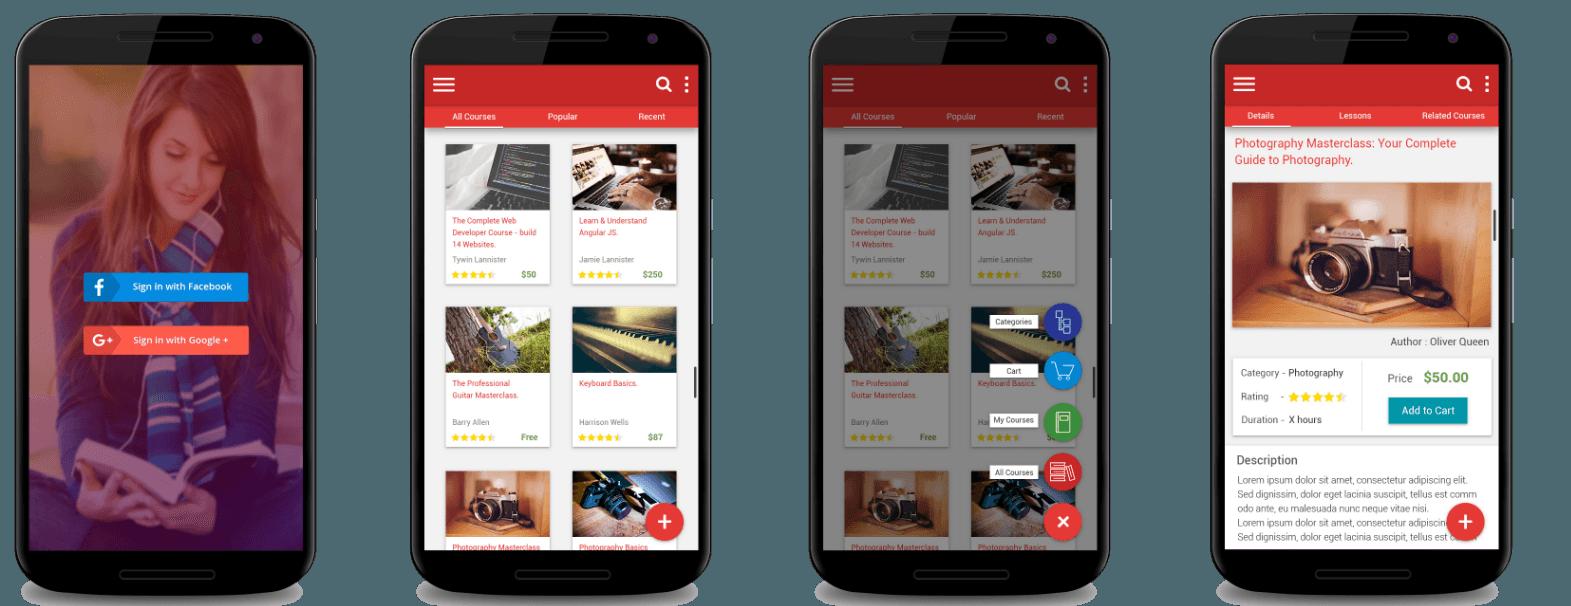 lms-app-1